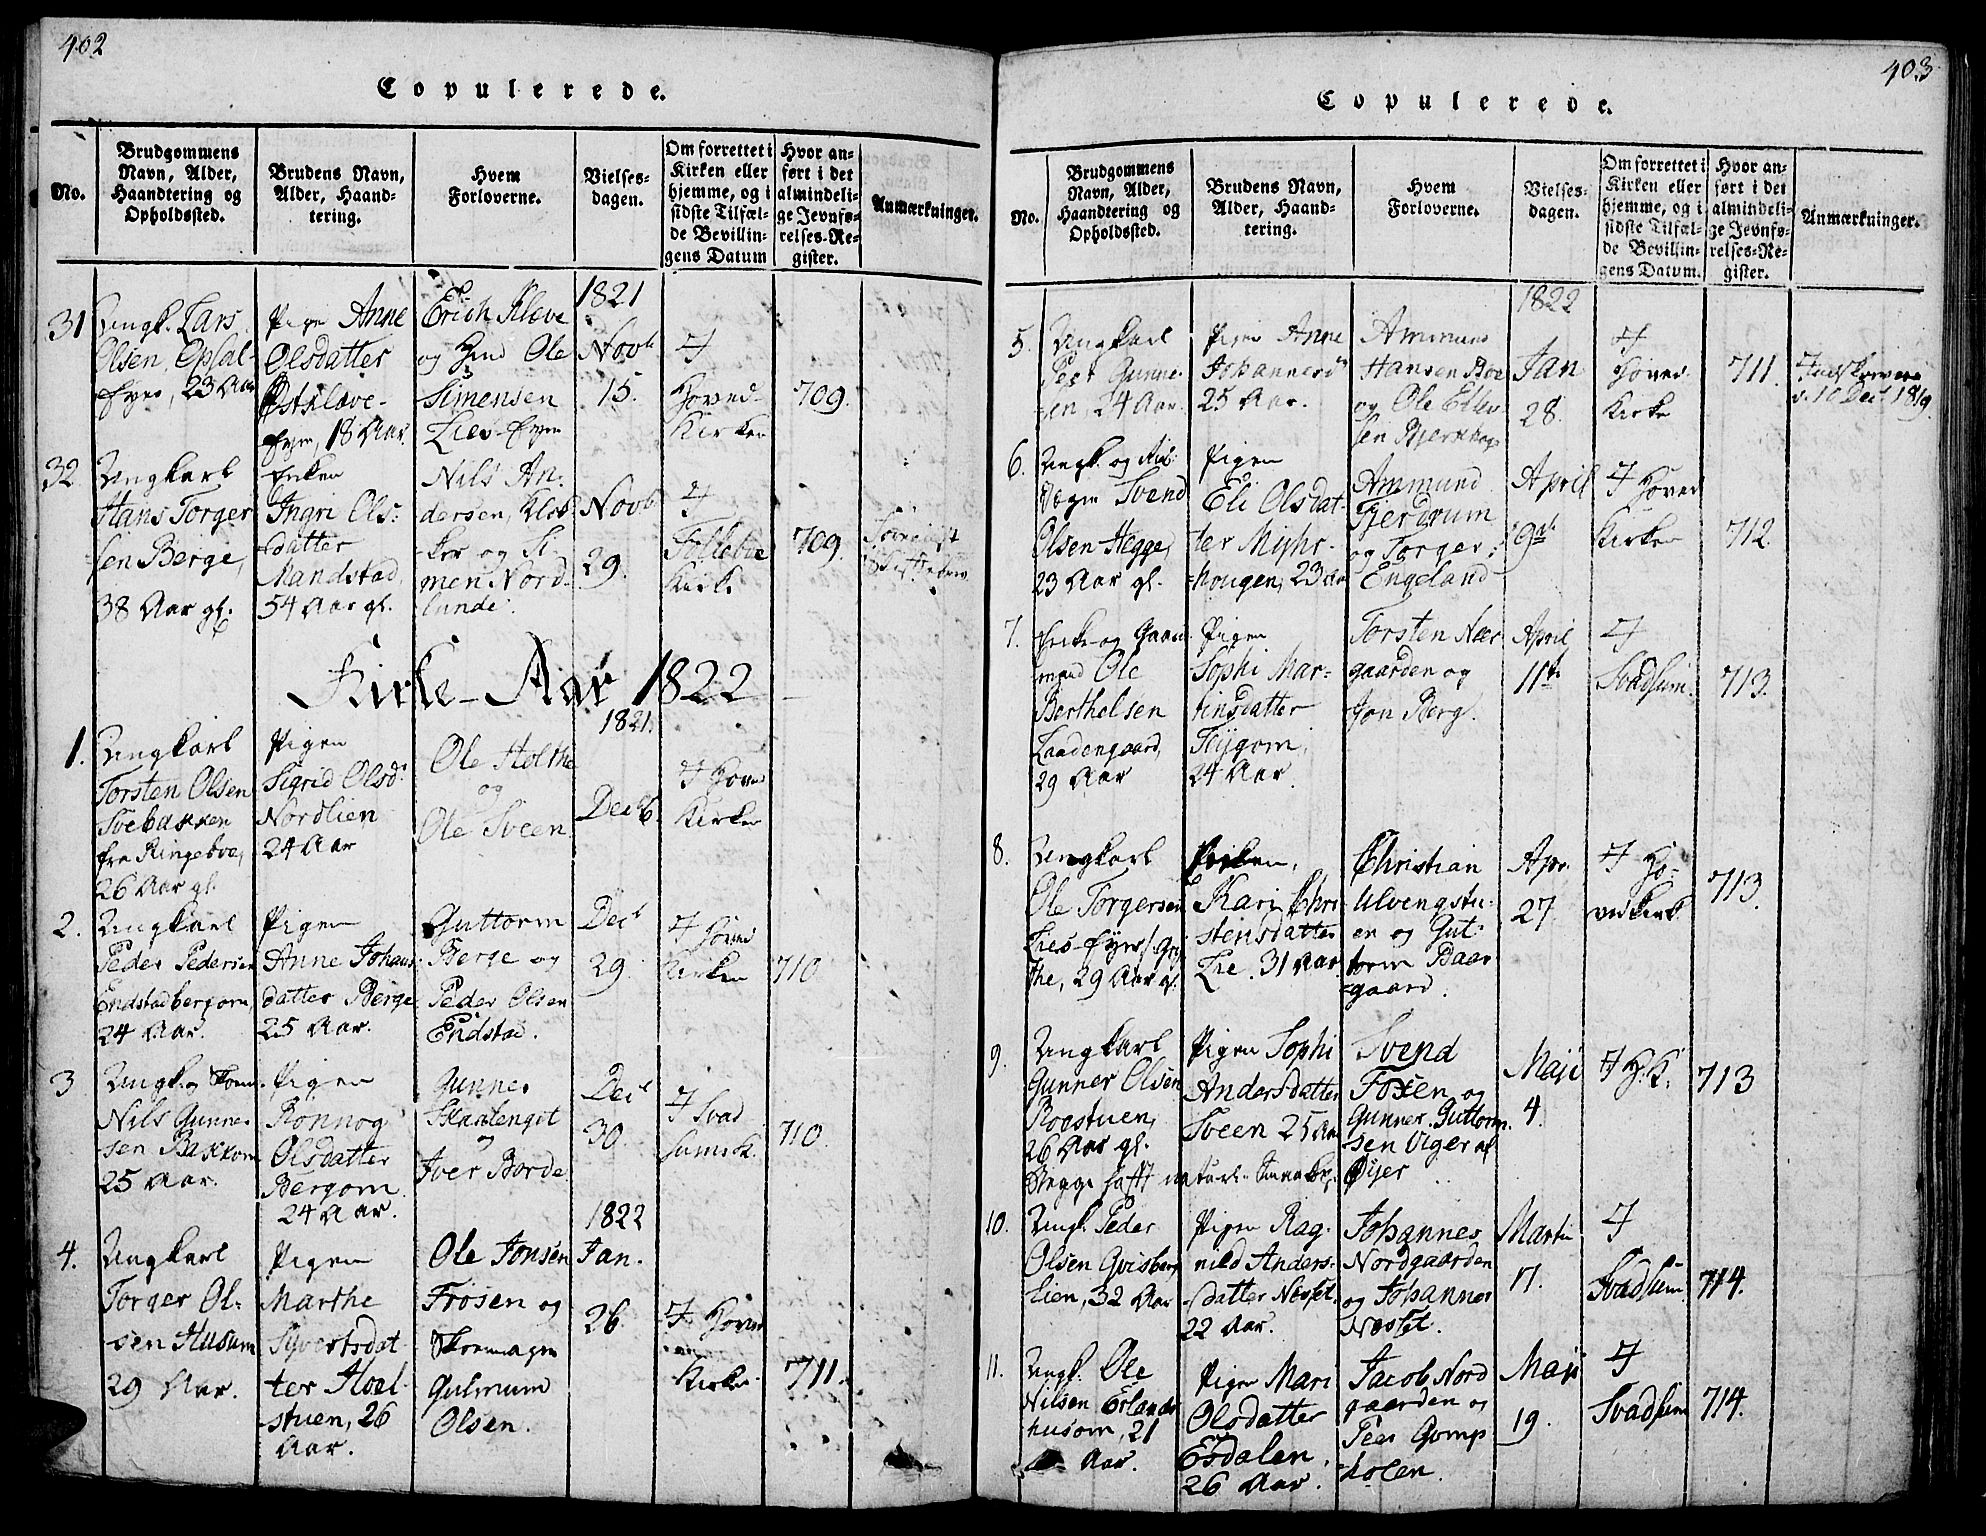 SAH, Gausdal prestekontor, Ministerialbok nr. 5, 1817-1829, s. 402-403